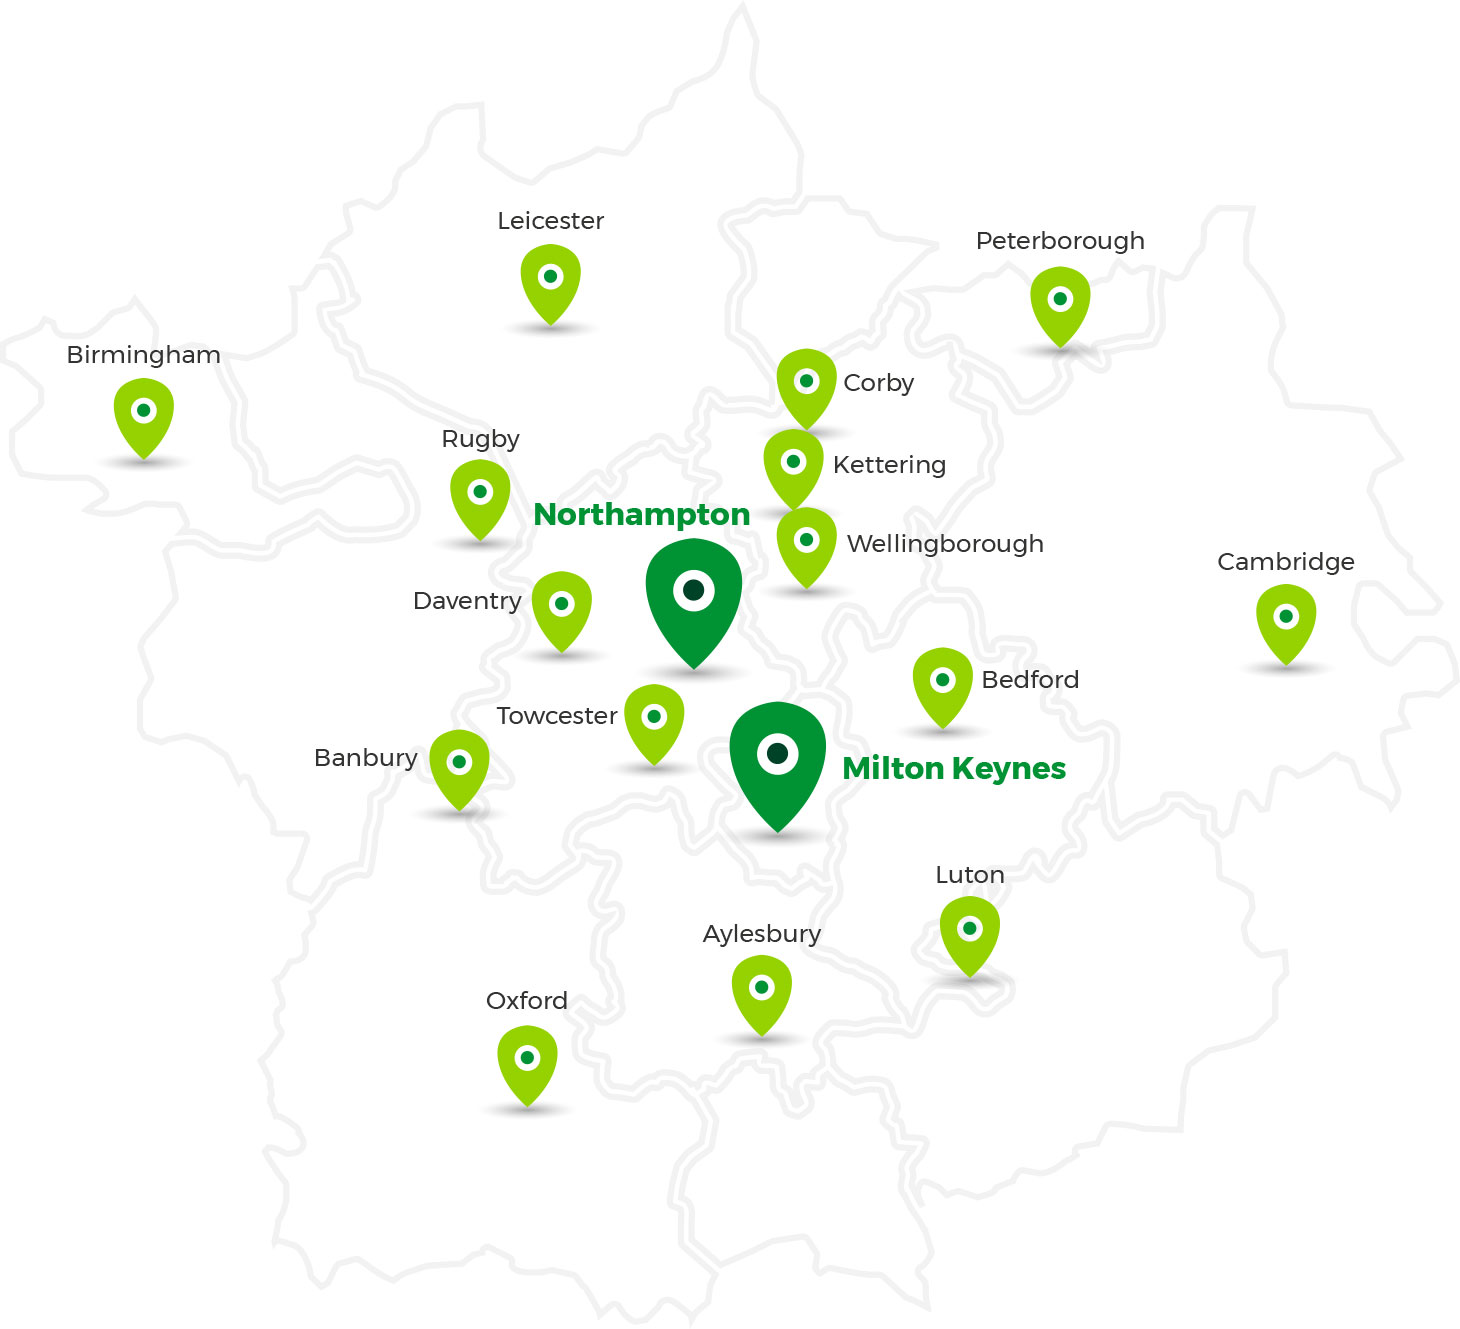 Covering Milton Keynes, Northampton, Birmingham, Leicester, Rugby, Banbury, Oxford, Peterborough, Corby, Kettering, Wellingborough, Bedford, Cambridge, Luton, Aylesbury